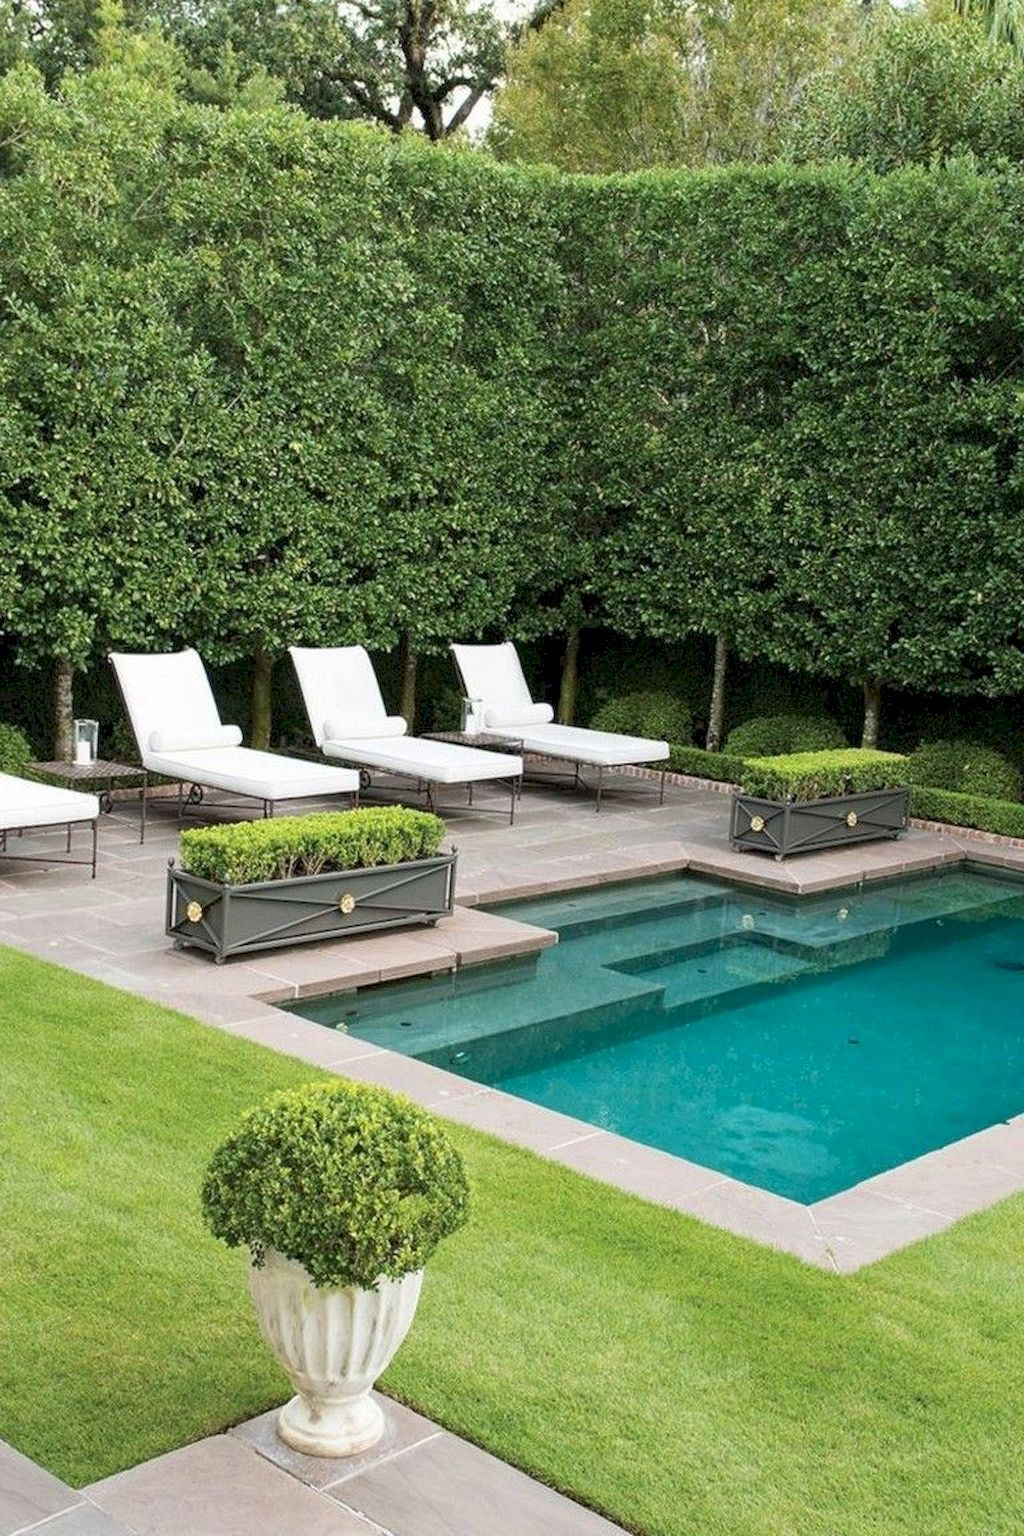 Small Backyard Swimming Pool Ideas And Design 89 Backyard Pool Designs Backyard Small Backyard Pools